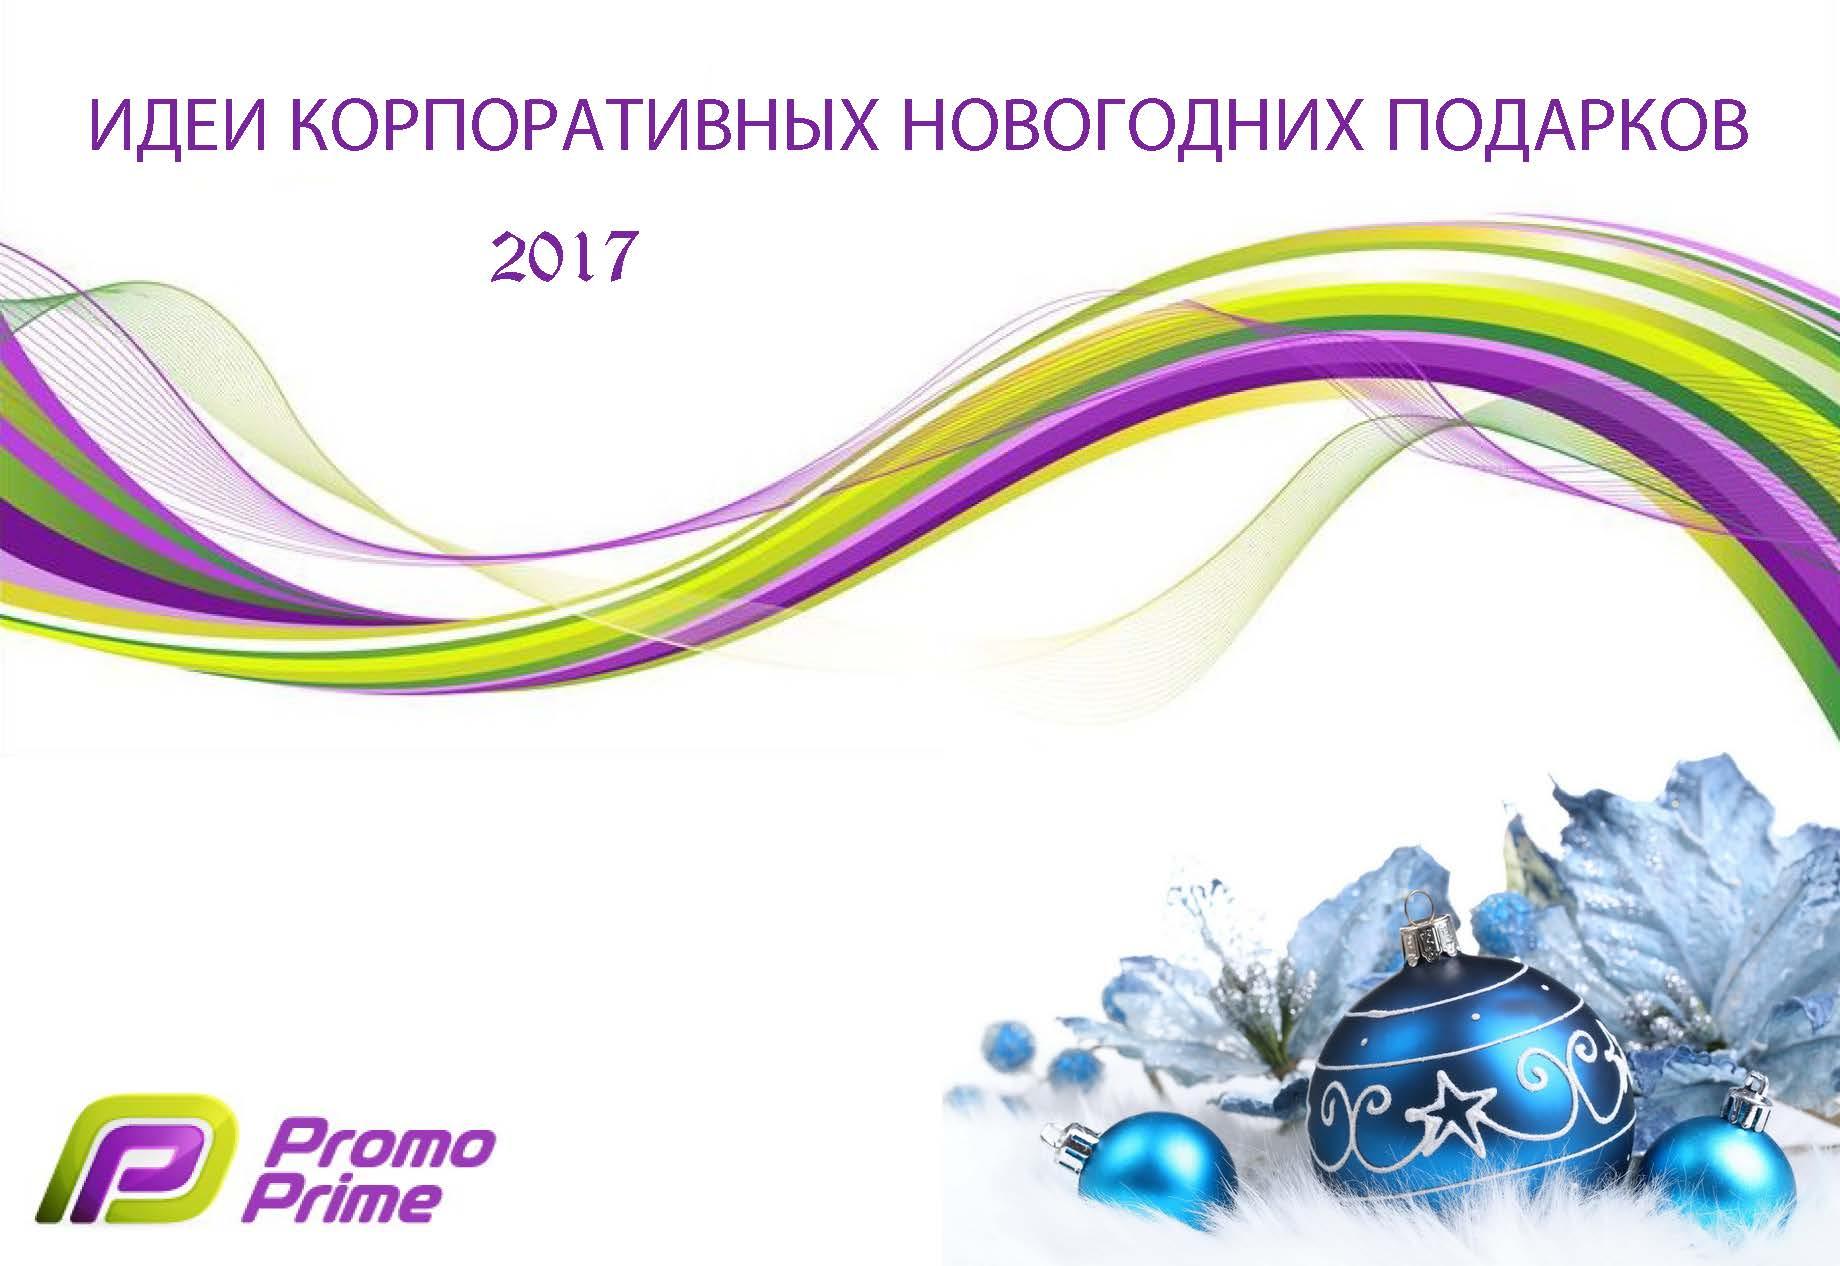 prezentation_ng_2017_stranitsa_01